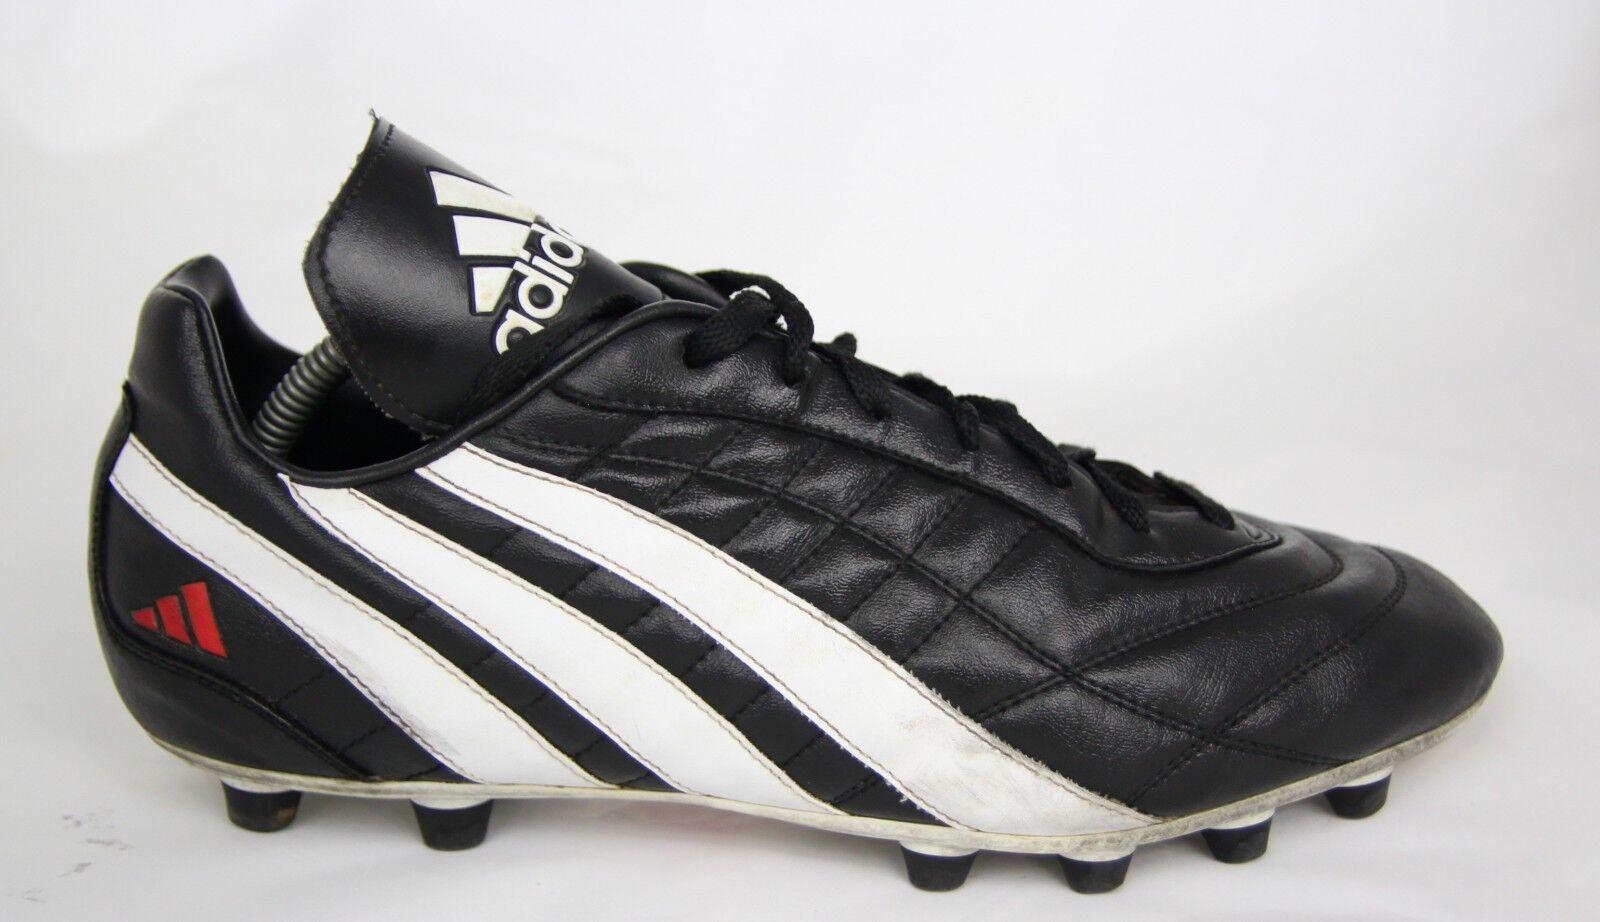 ADIDAS _ 1999 _ World Cup Footbtutti Vintage Misura 10 Sautope da calcio 28,5 cm